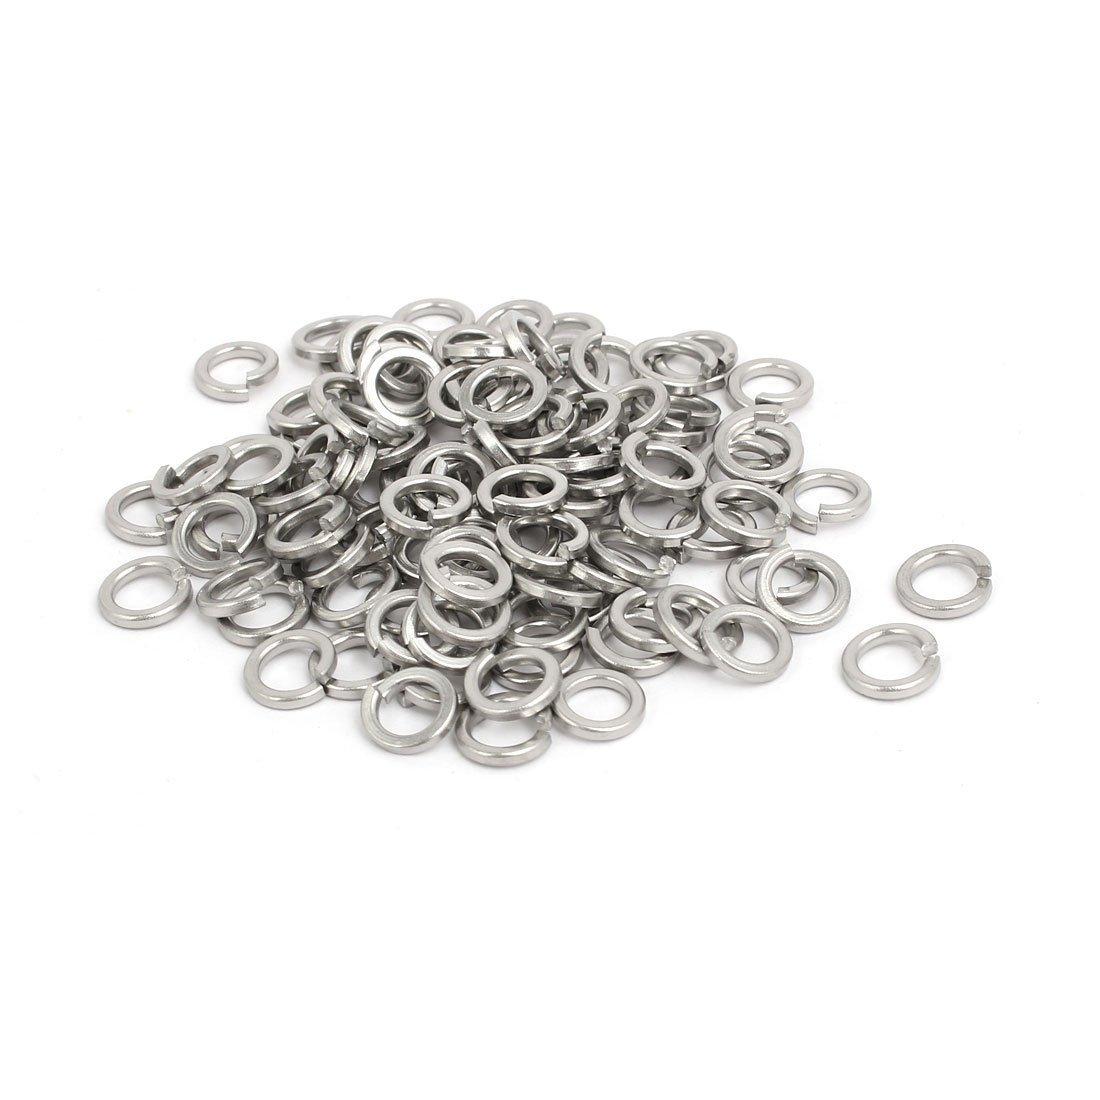 uxcell M5 Inner Diameter 304 Stainless Steel Split Lock Spring Washers Gasket 100pcs